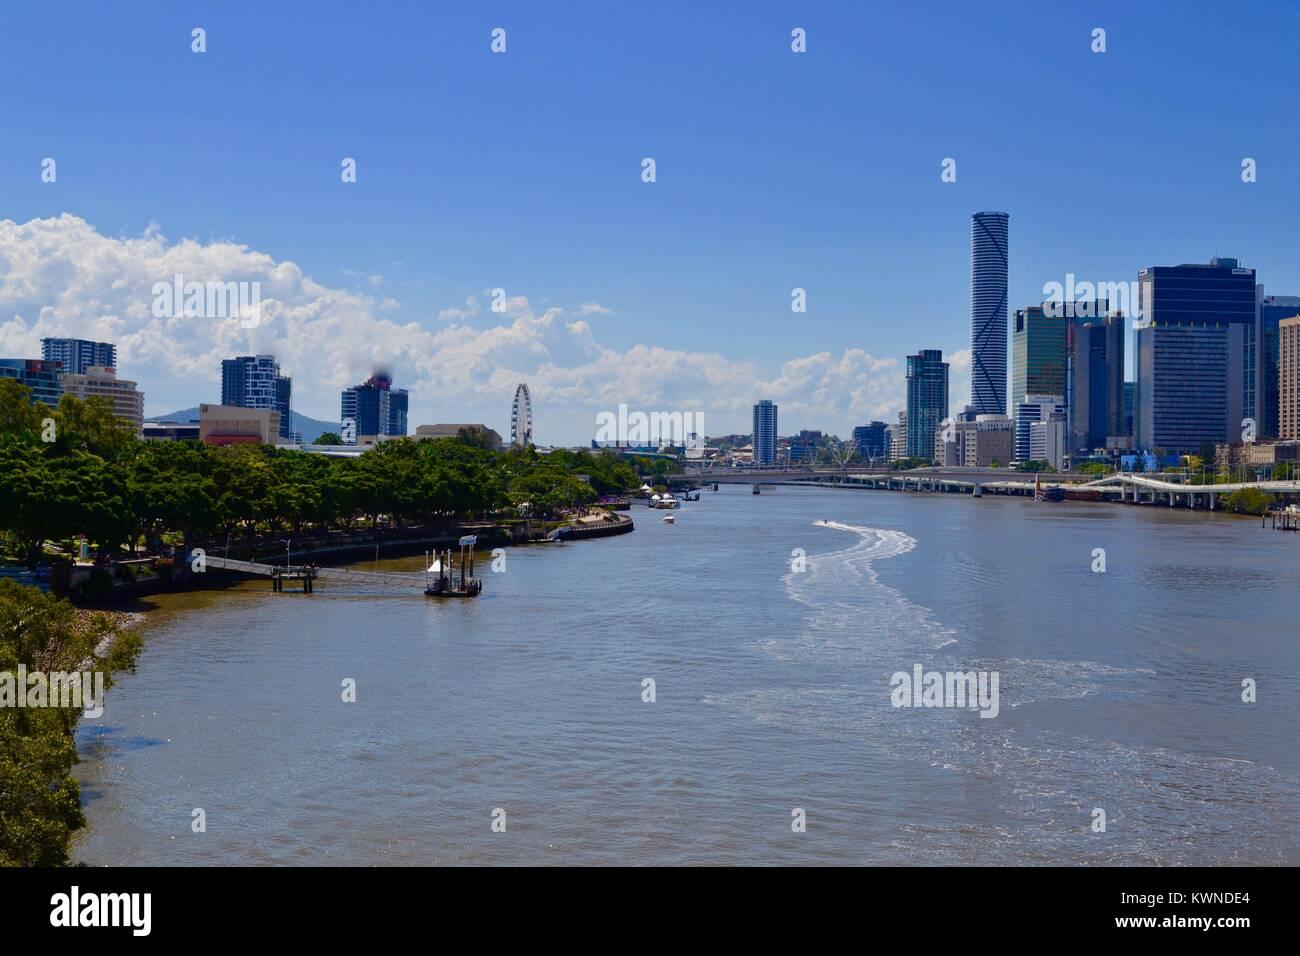 Brisbane River, Brisbane, Australia - Stock Image